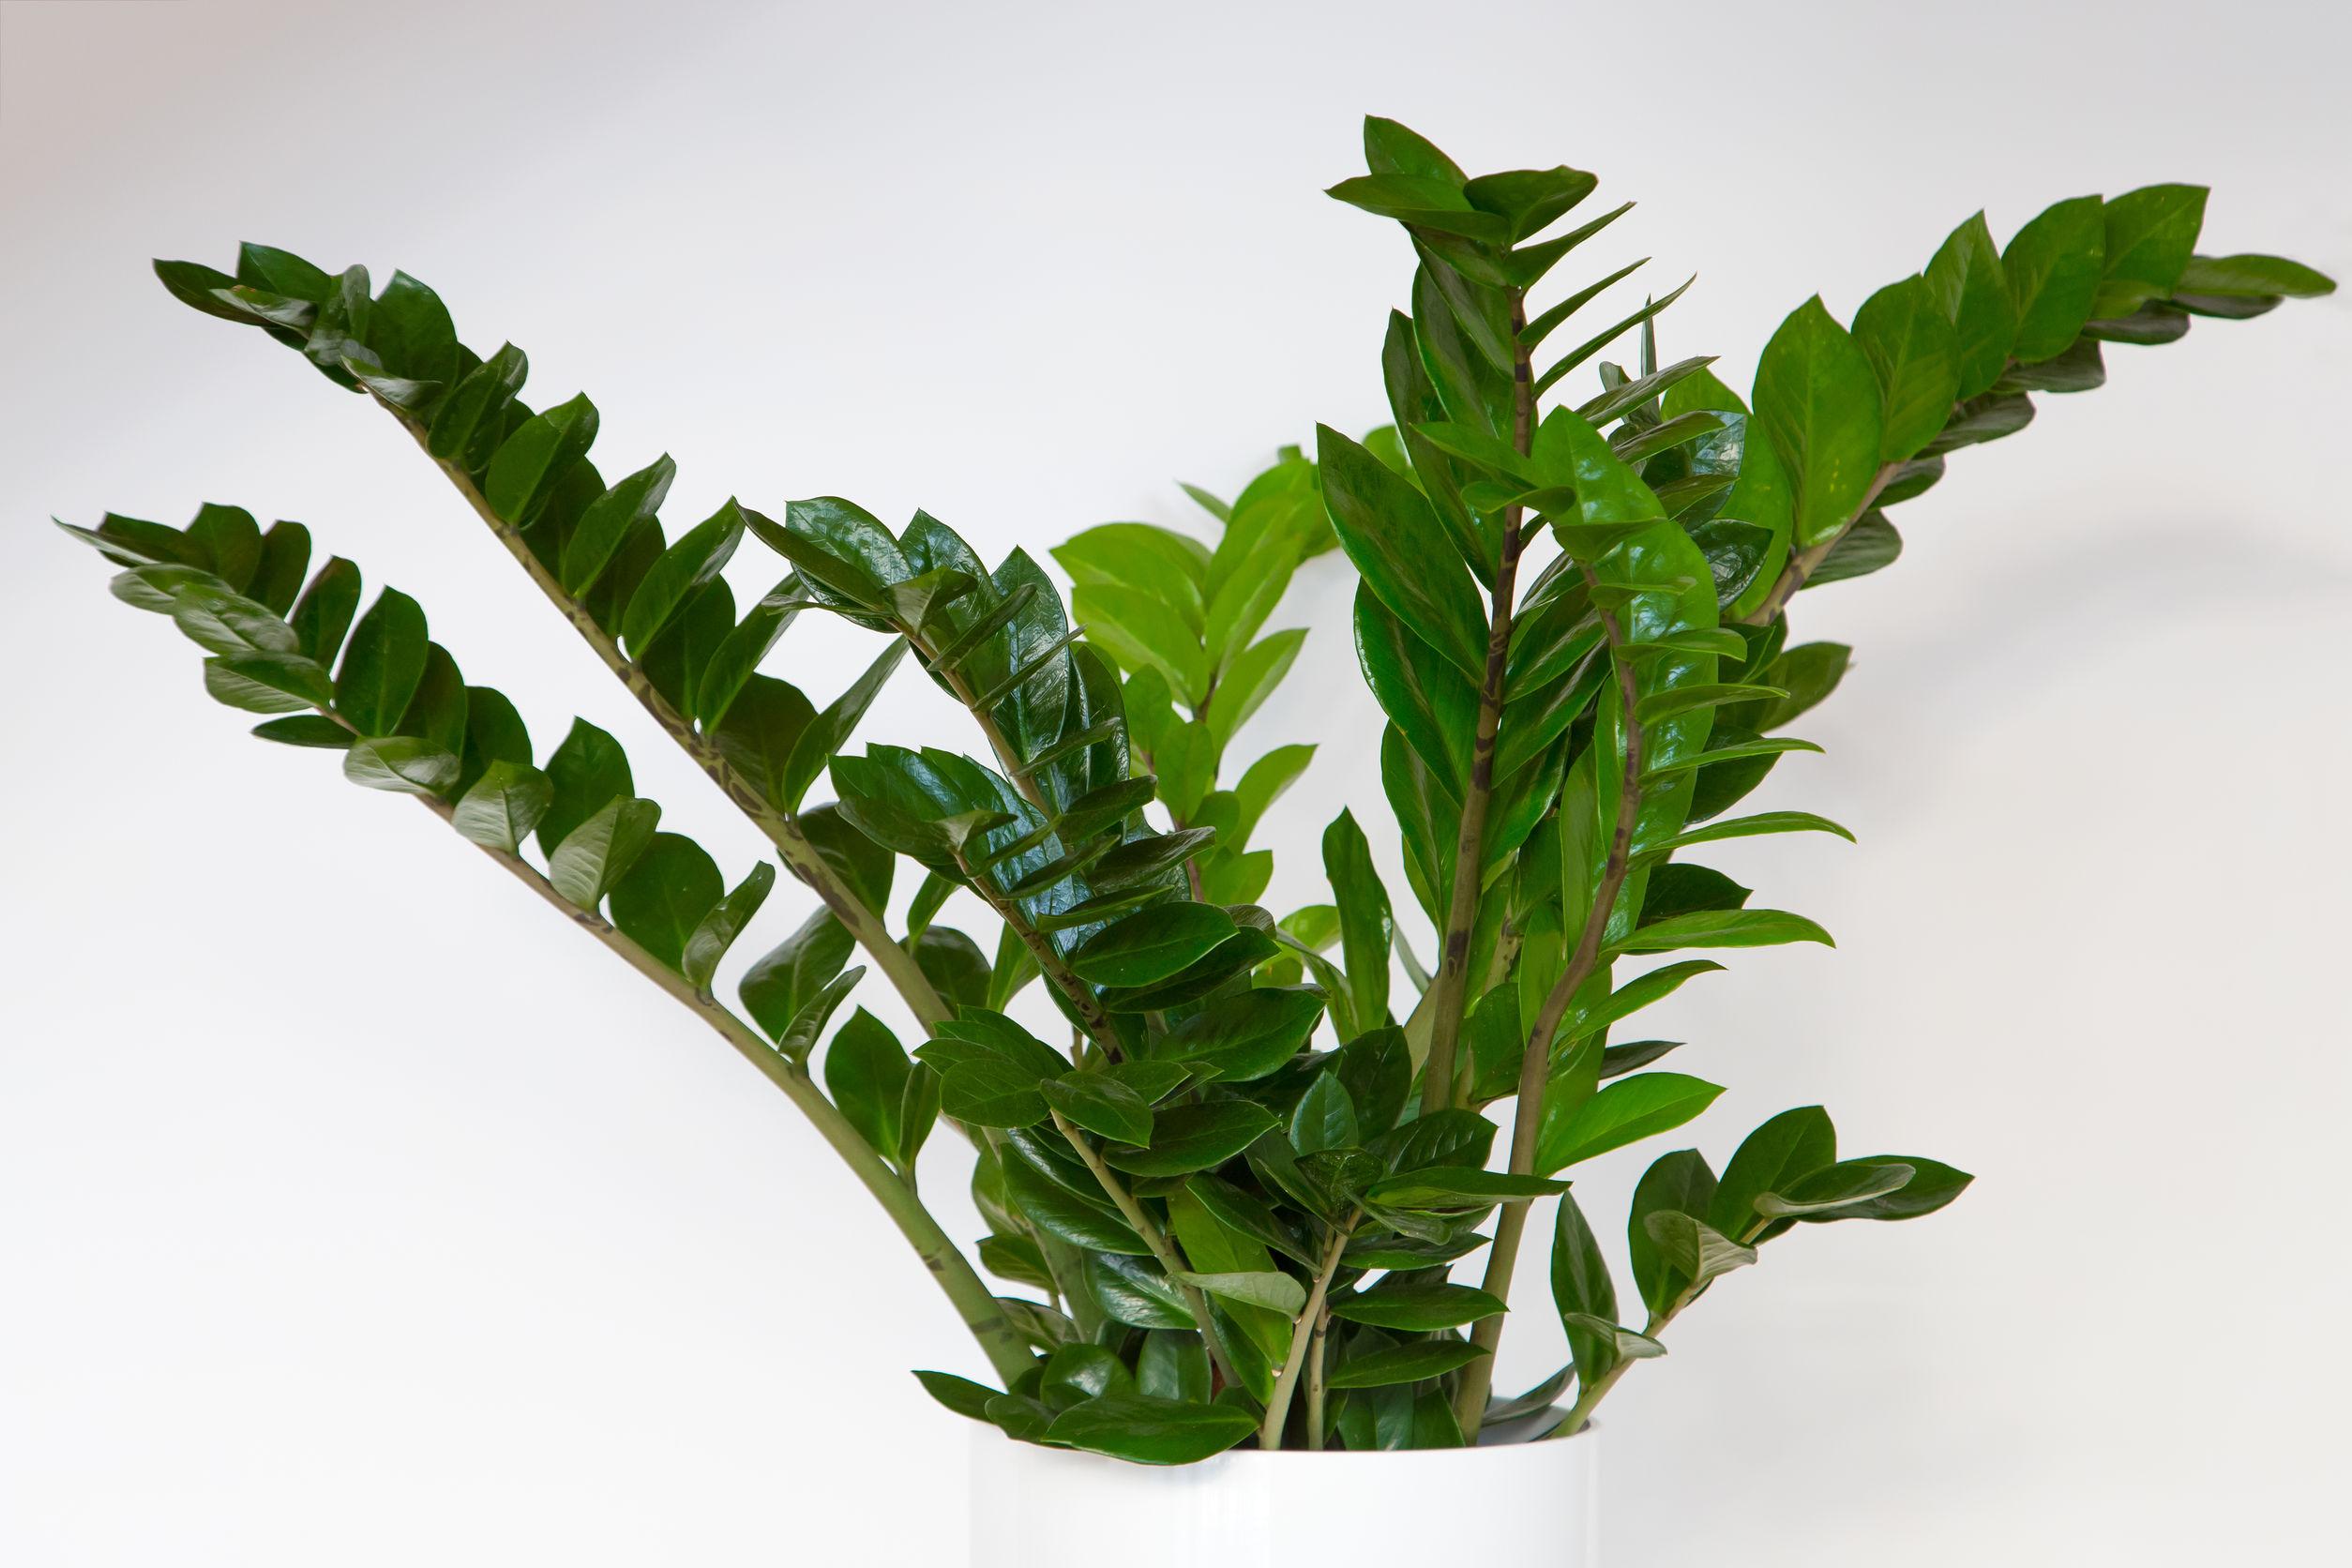 Pinigų medis (Zamiokulkas)